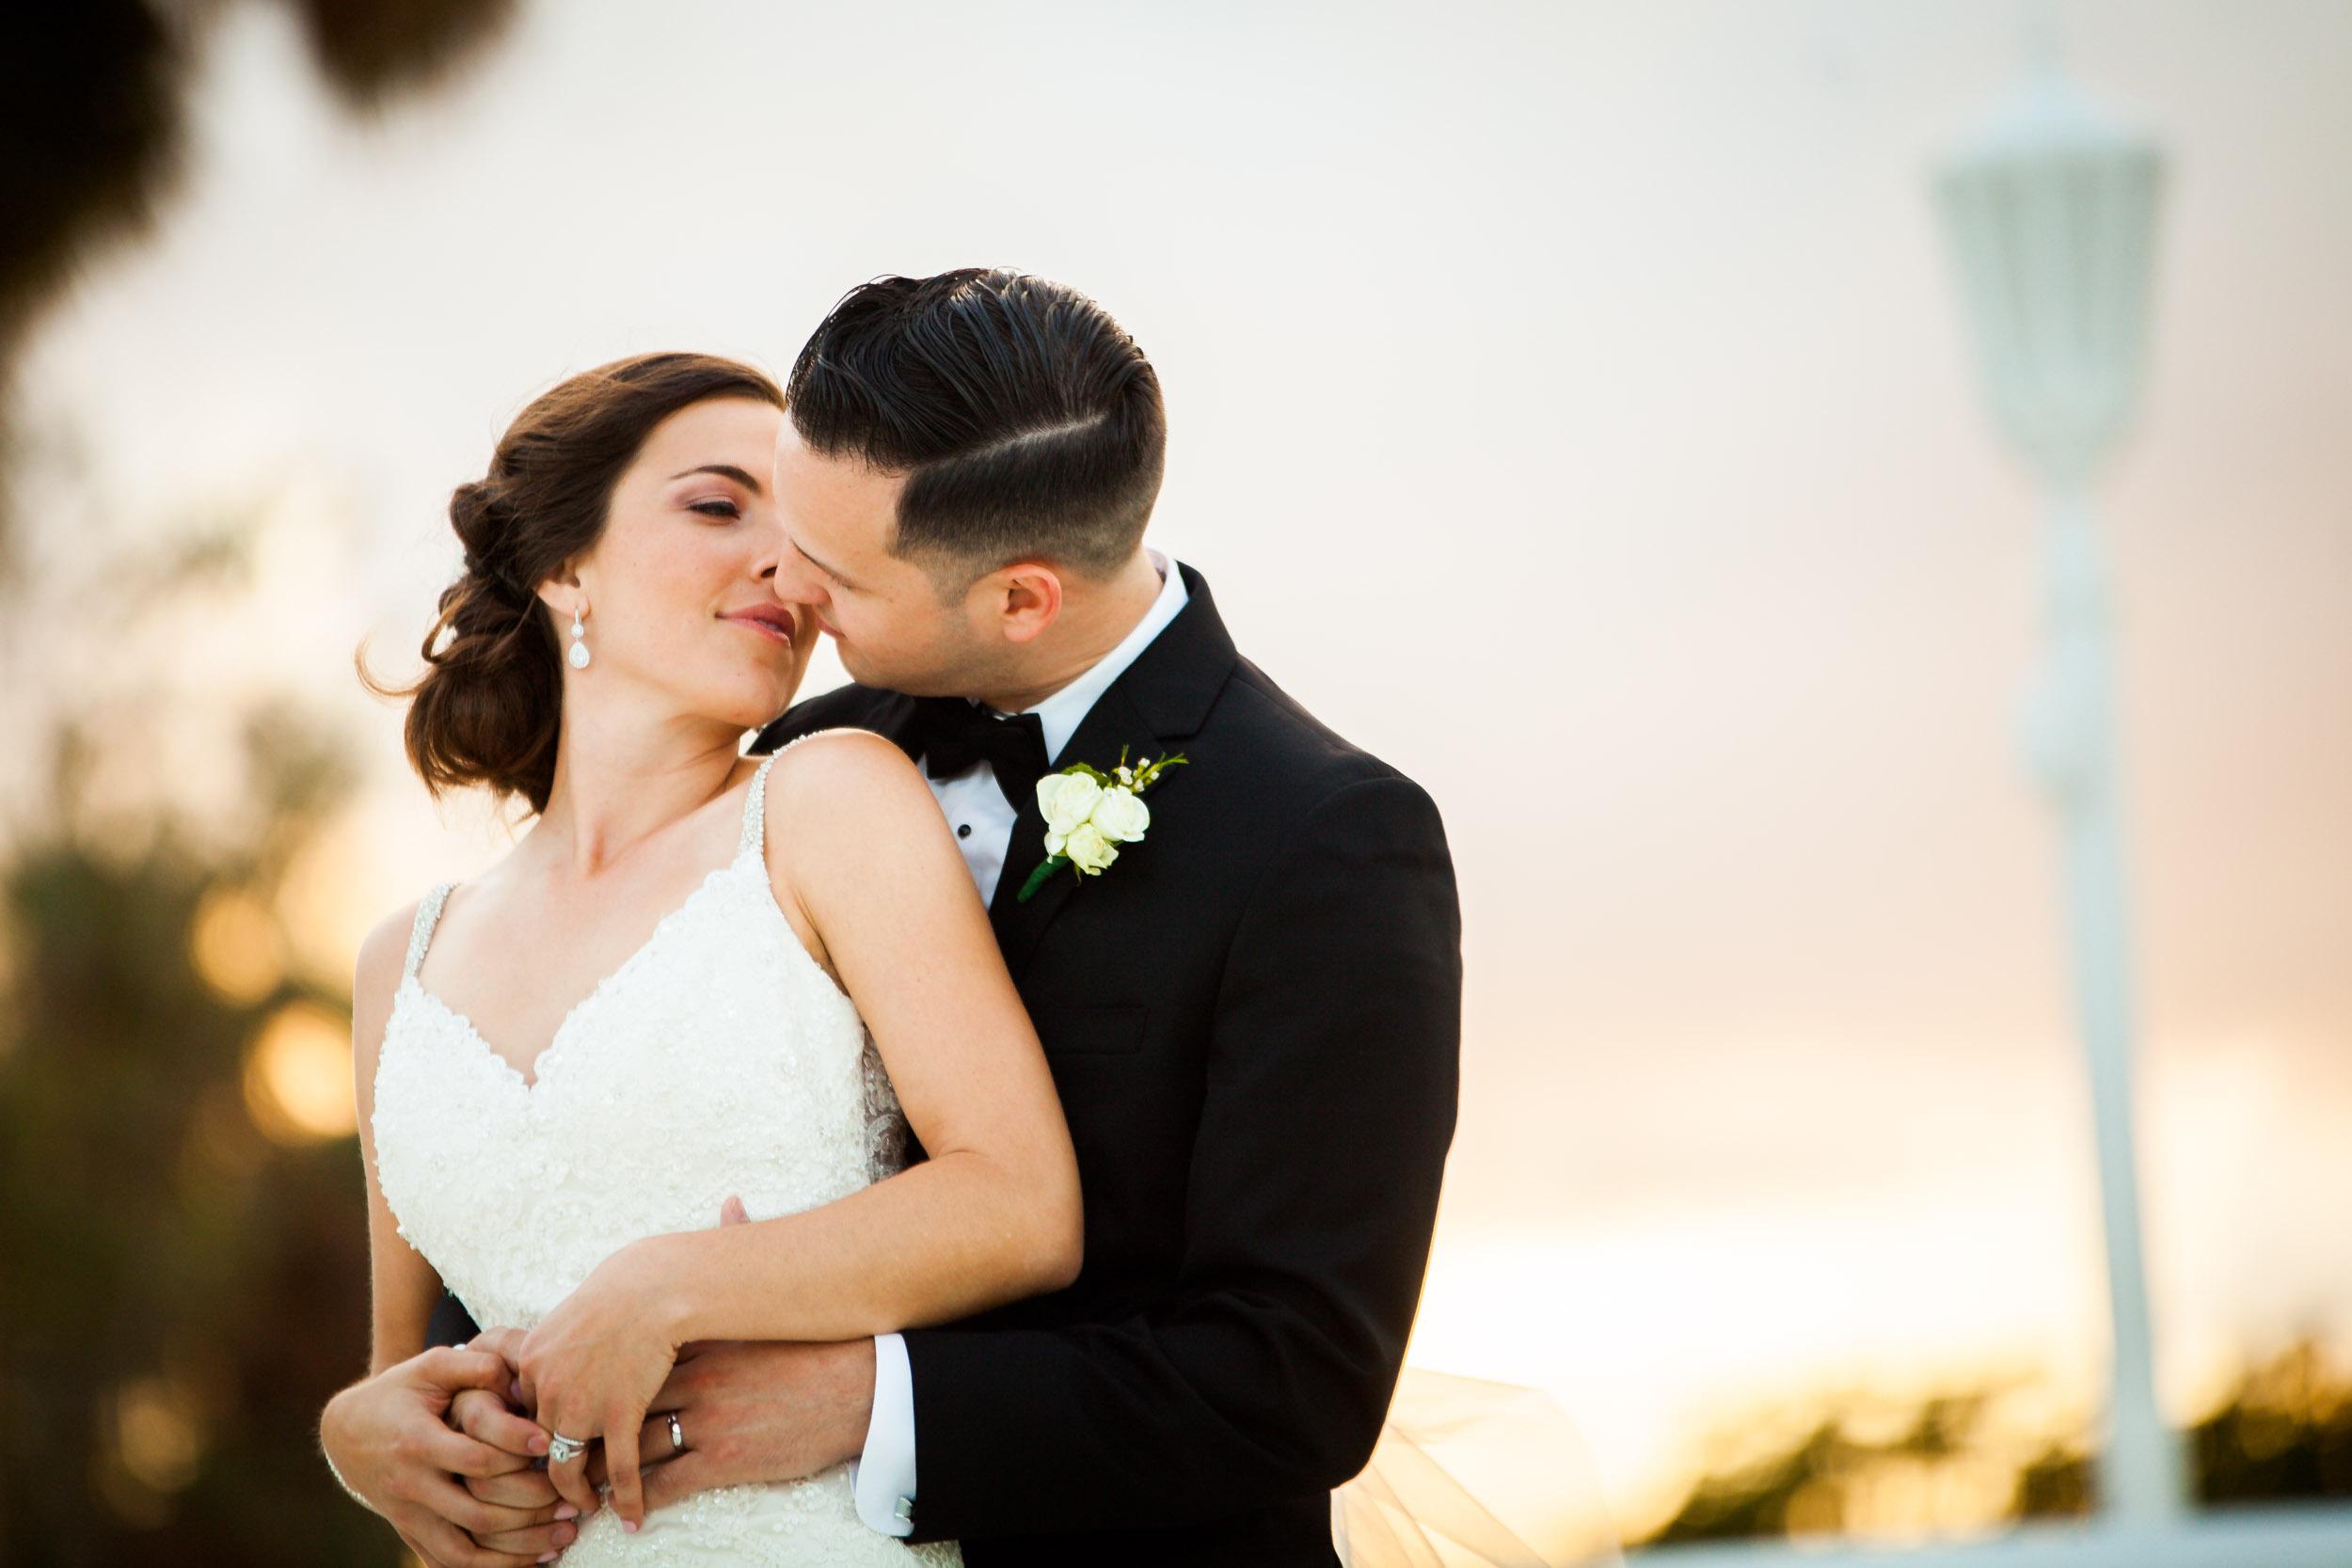 Flordia-Wedding-Photography-51.jpg